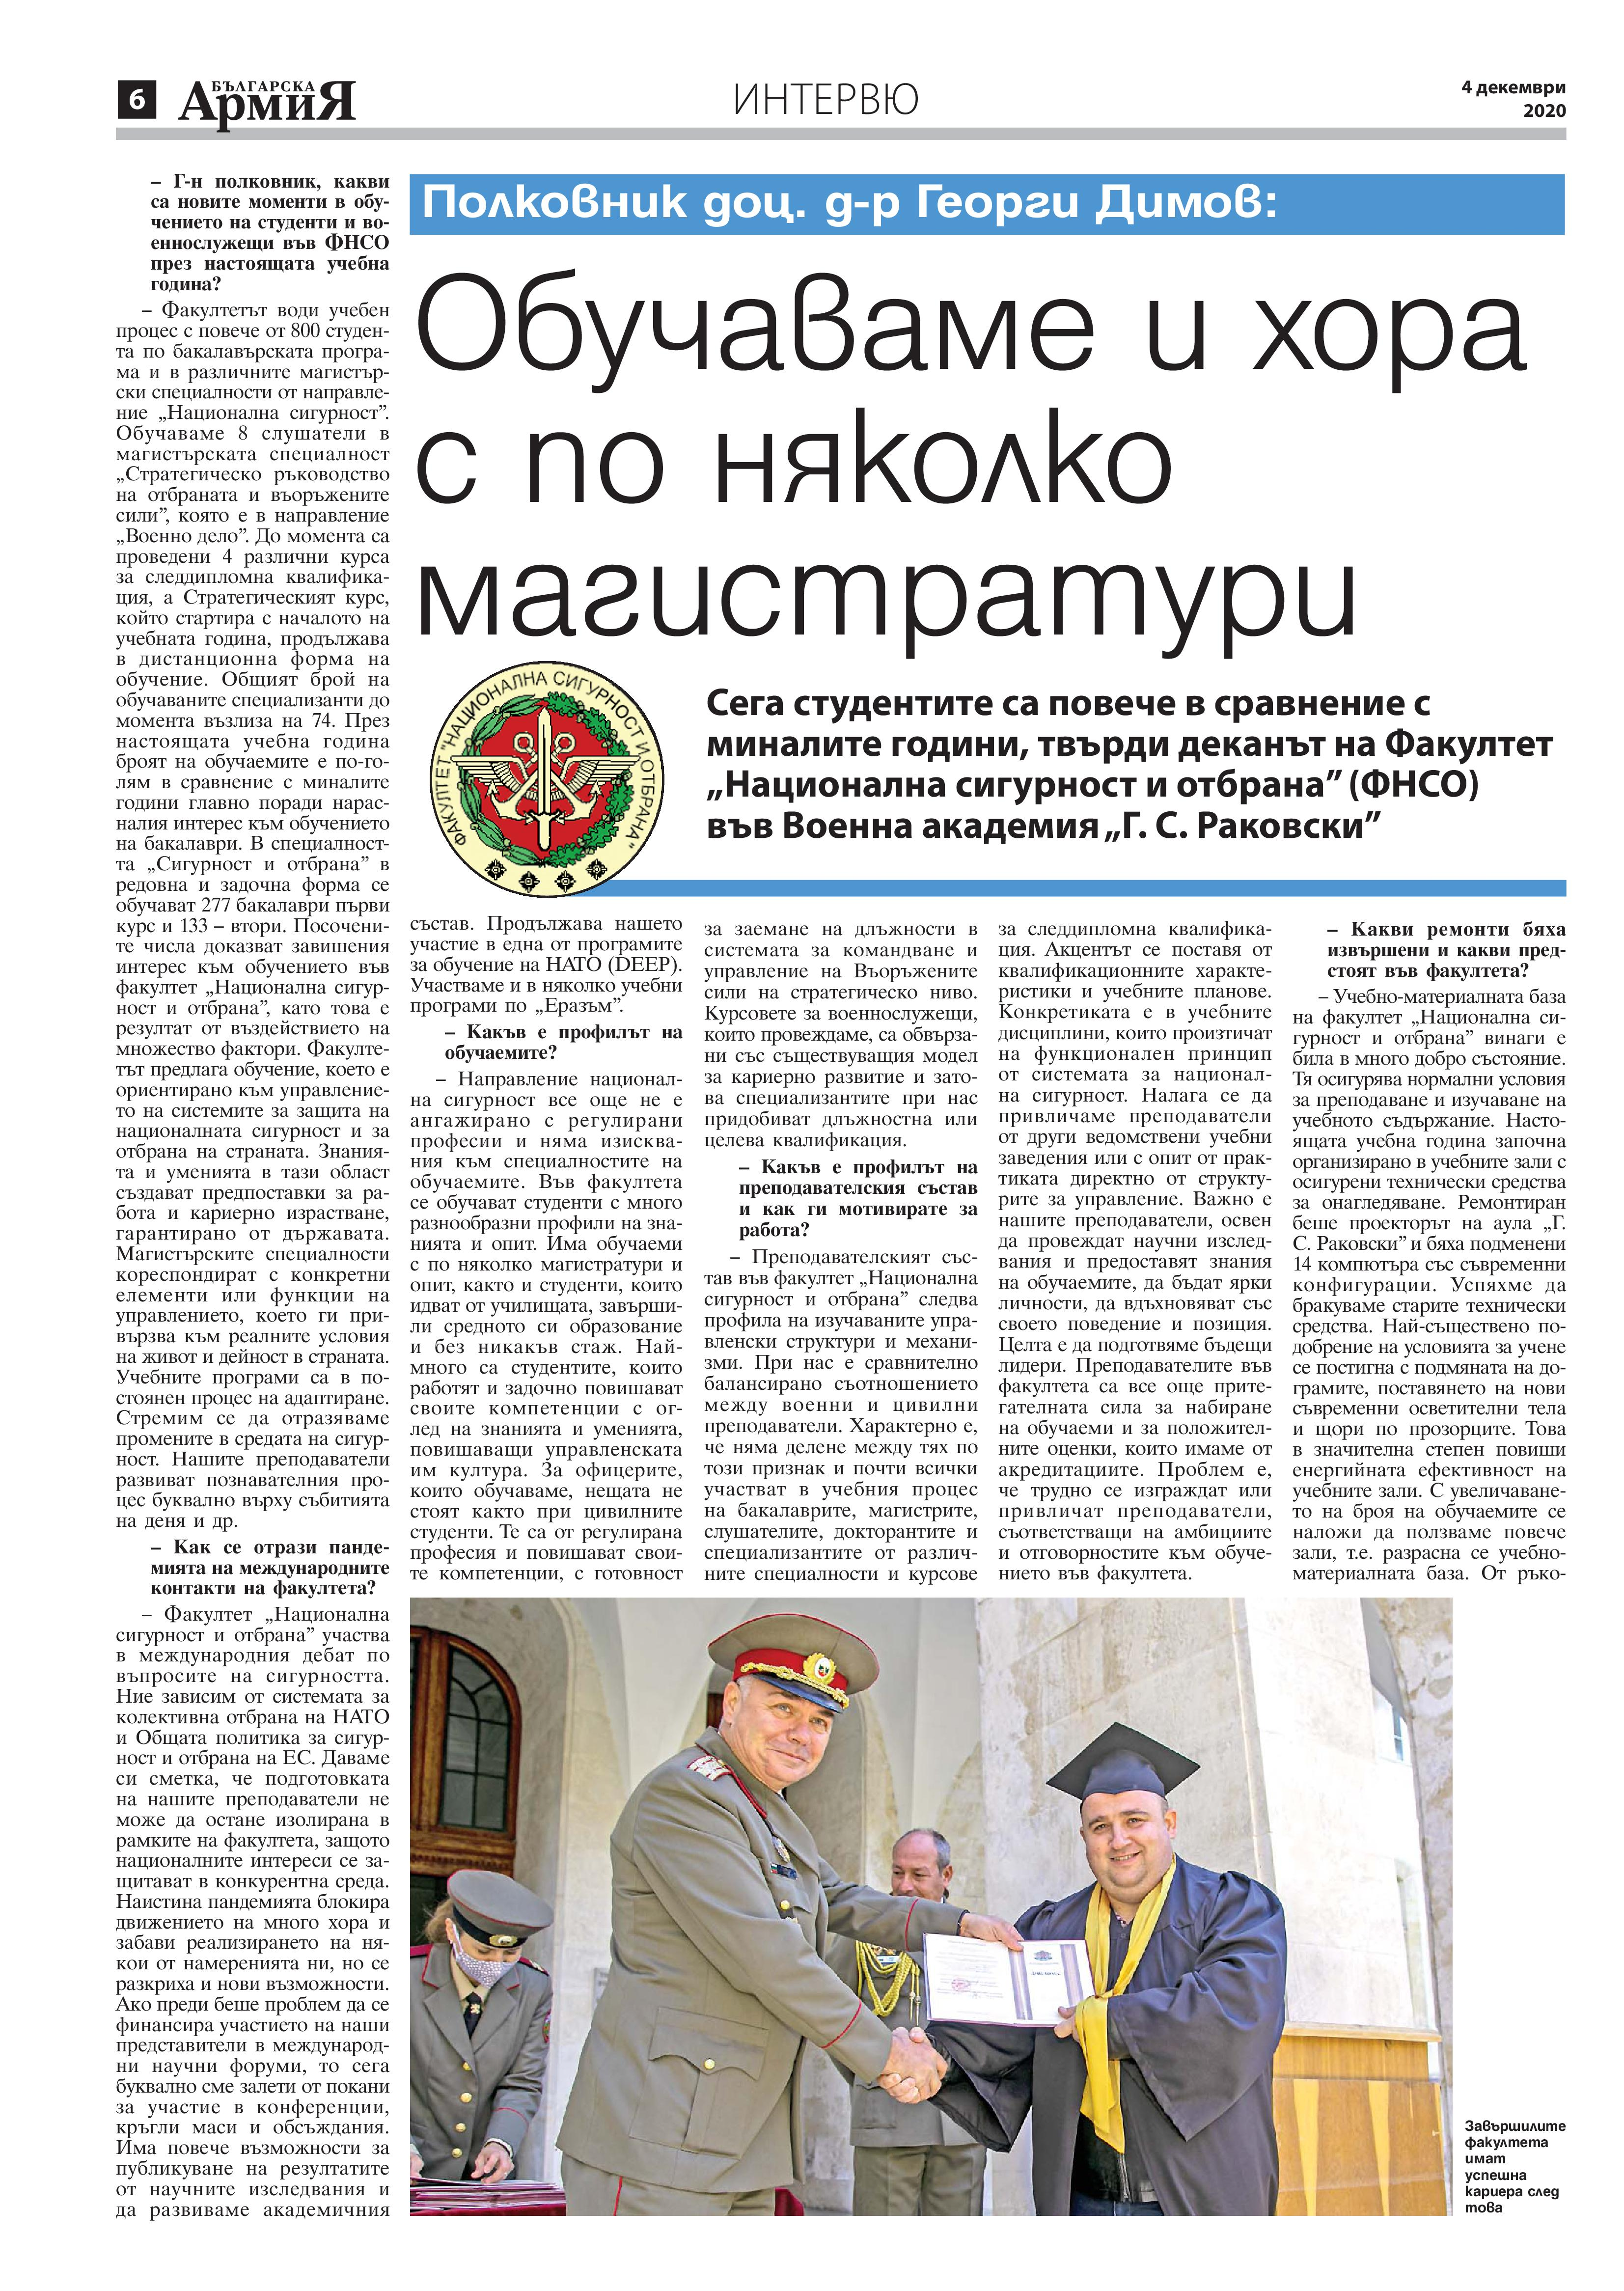 https://www.armymedia.bg/wp-content/uploads/2015/06/06-50.jpg